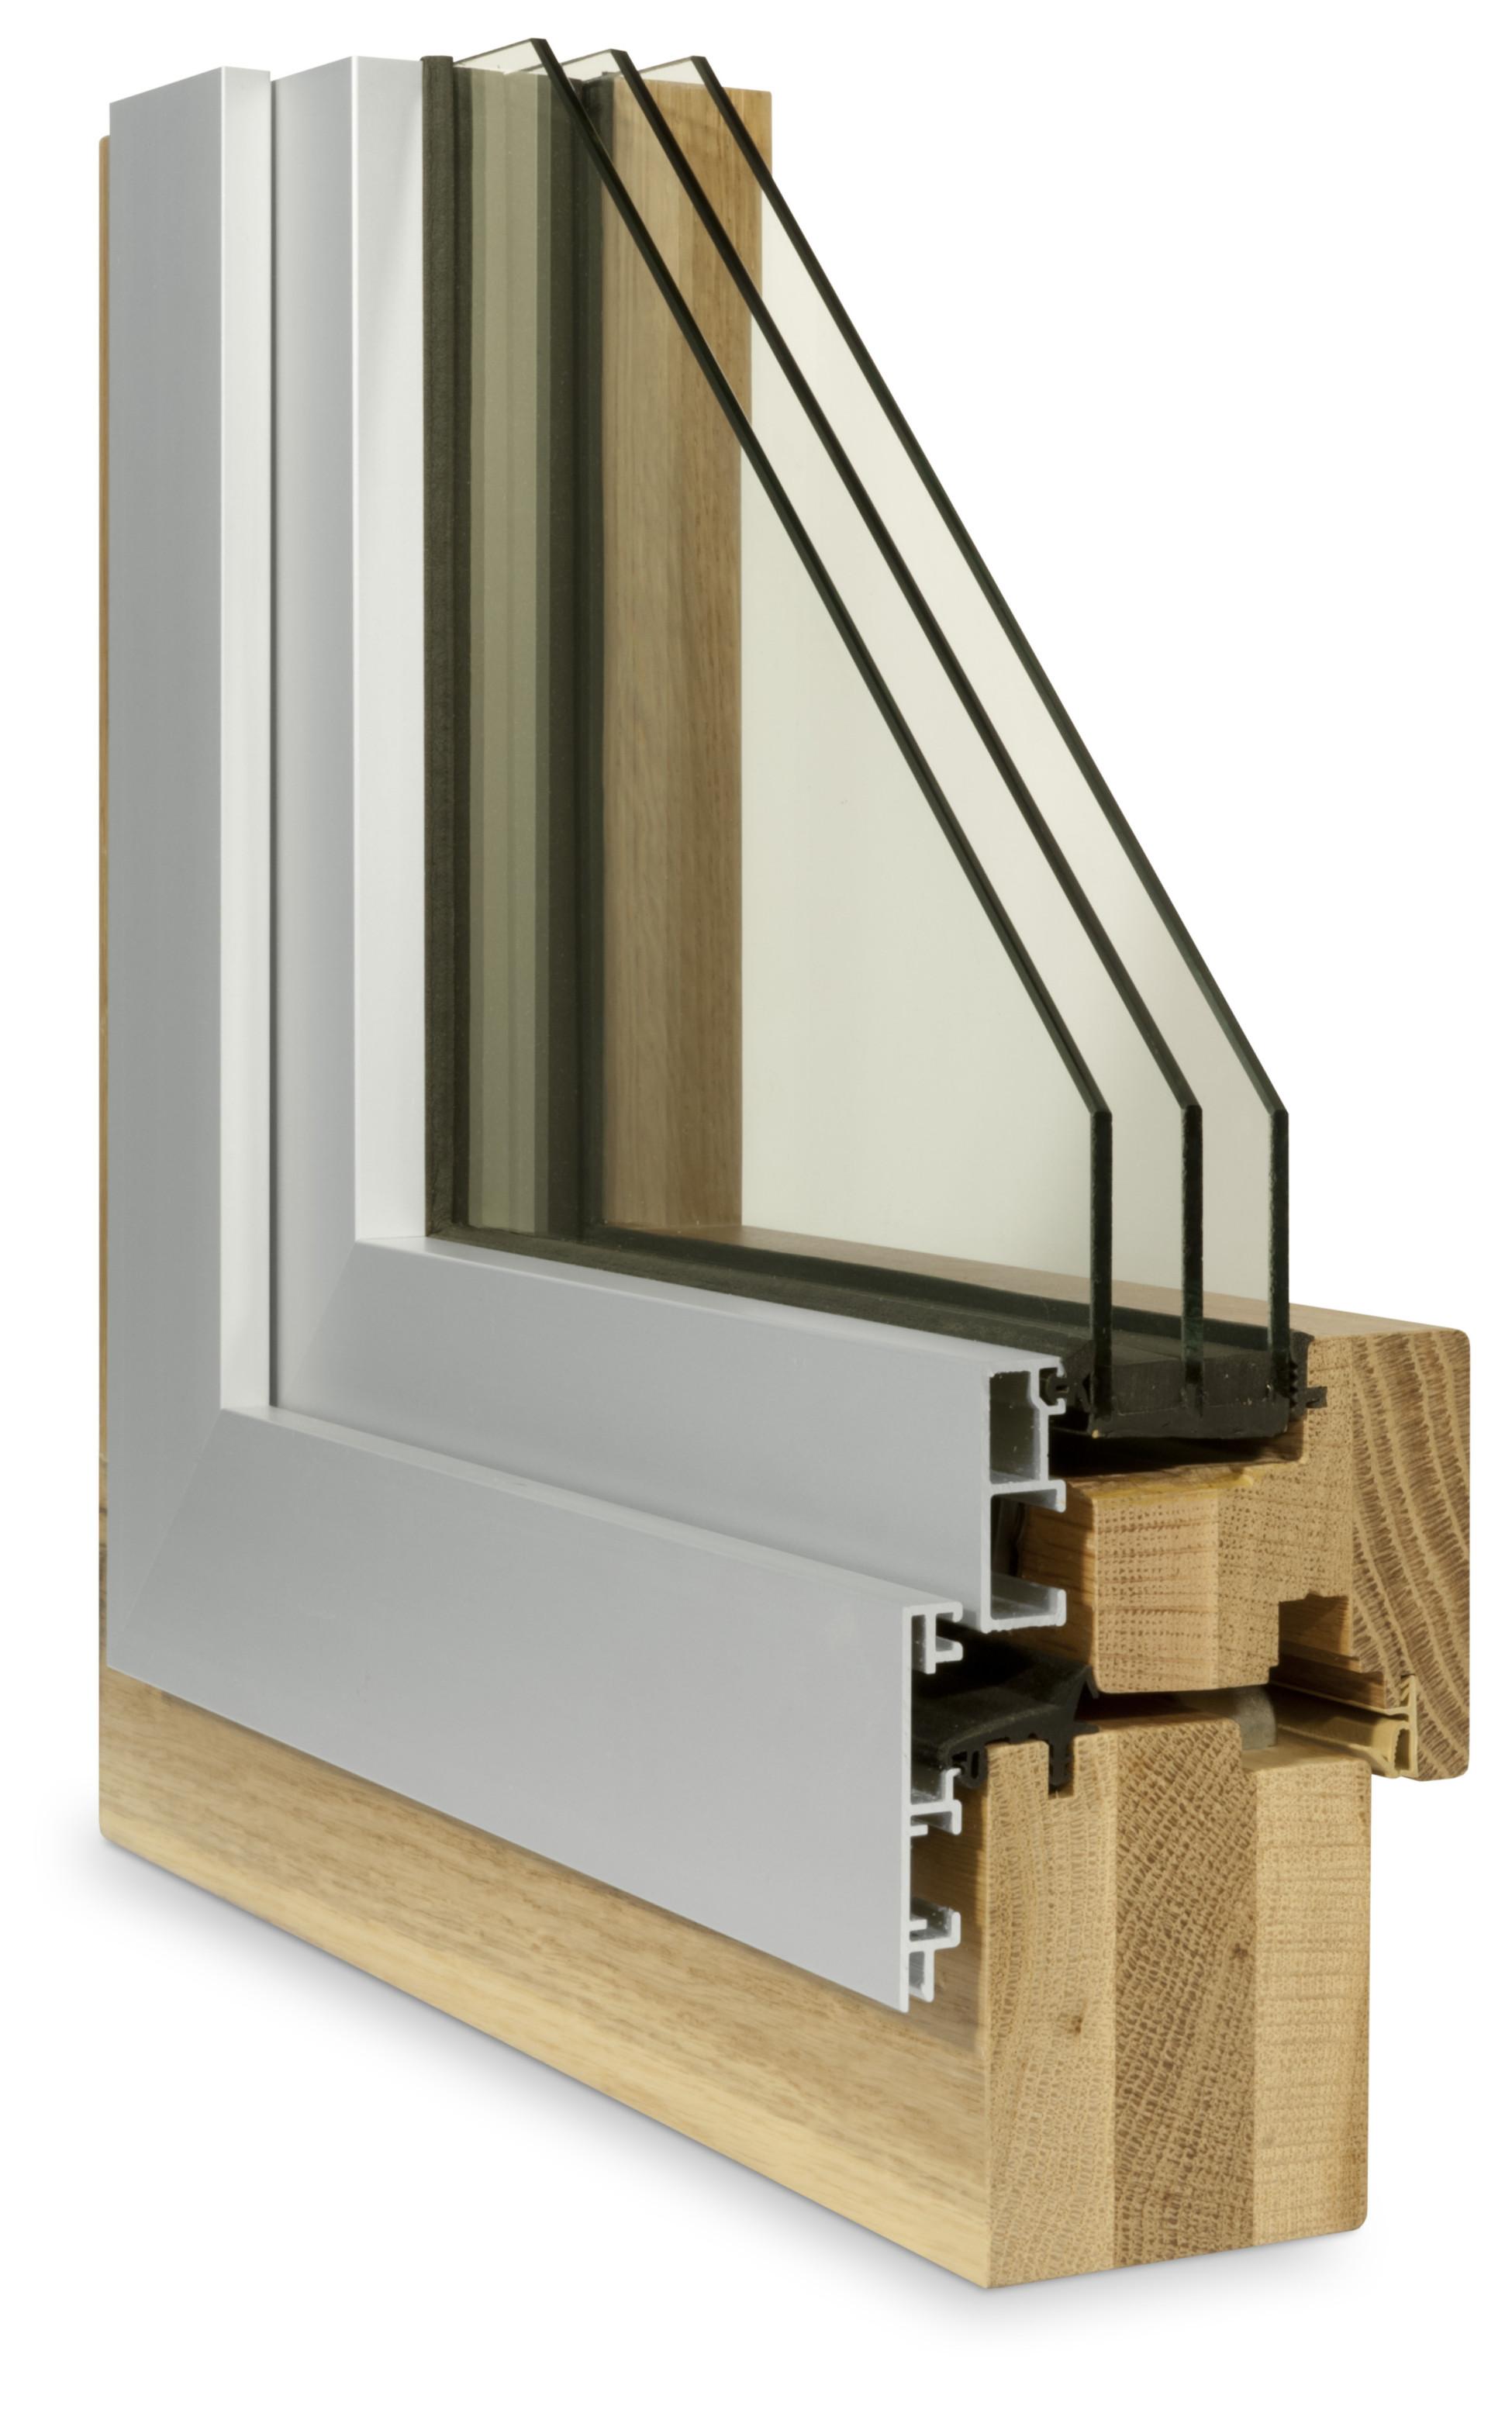 Fensterschnittmuster